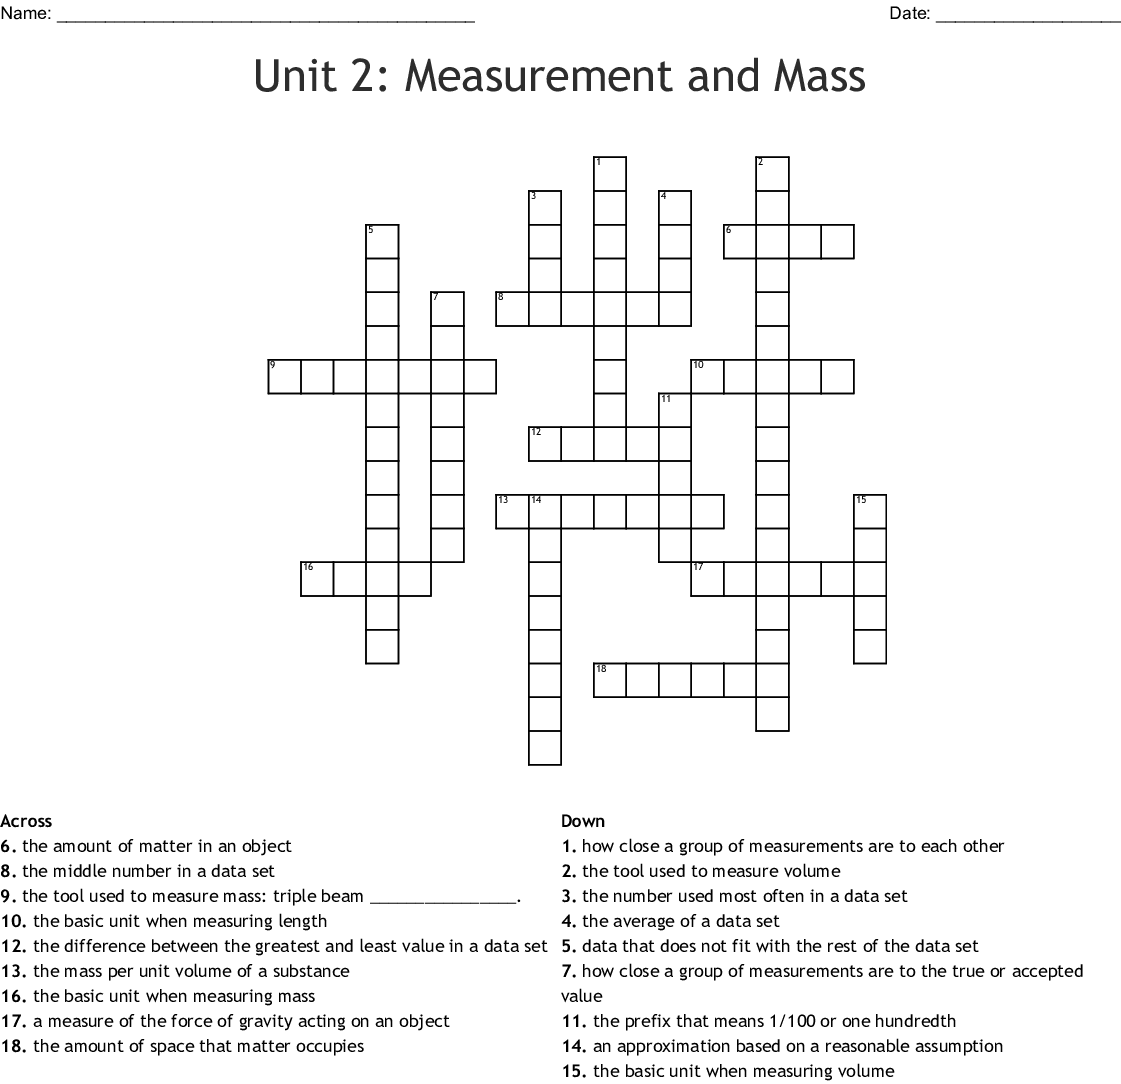 Unit 2 Measurement And Mass Crossword Wordmint